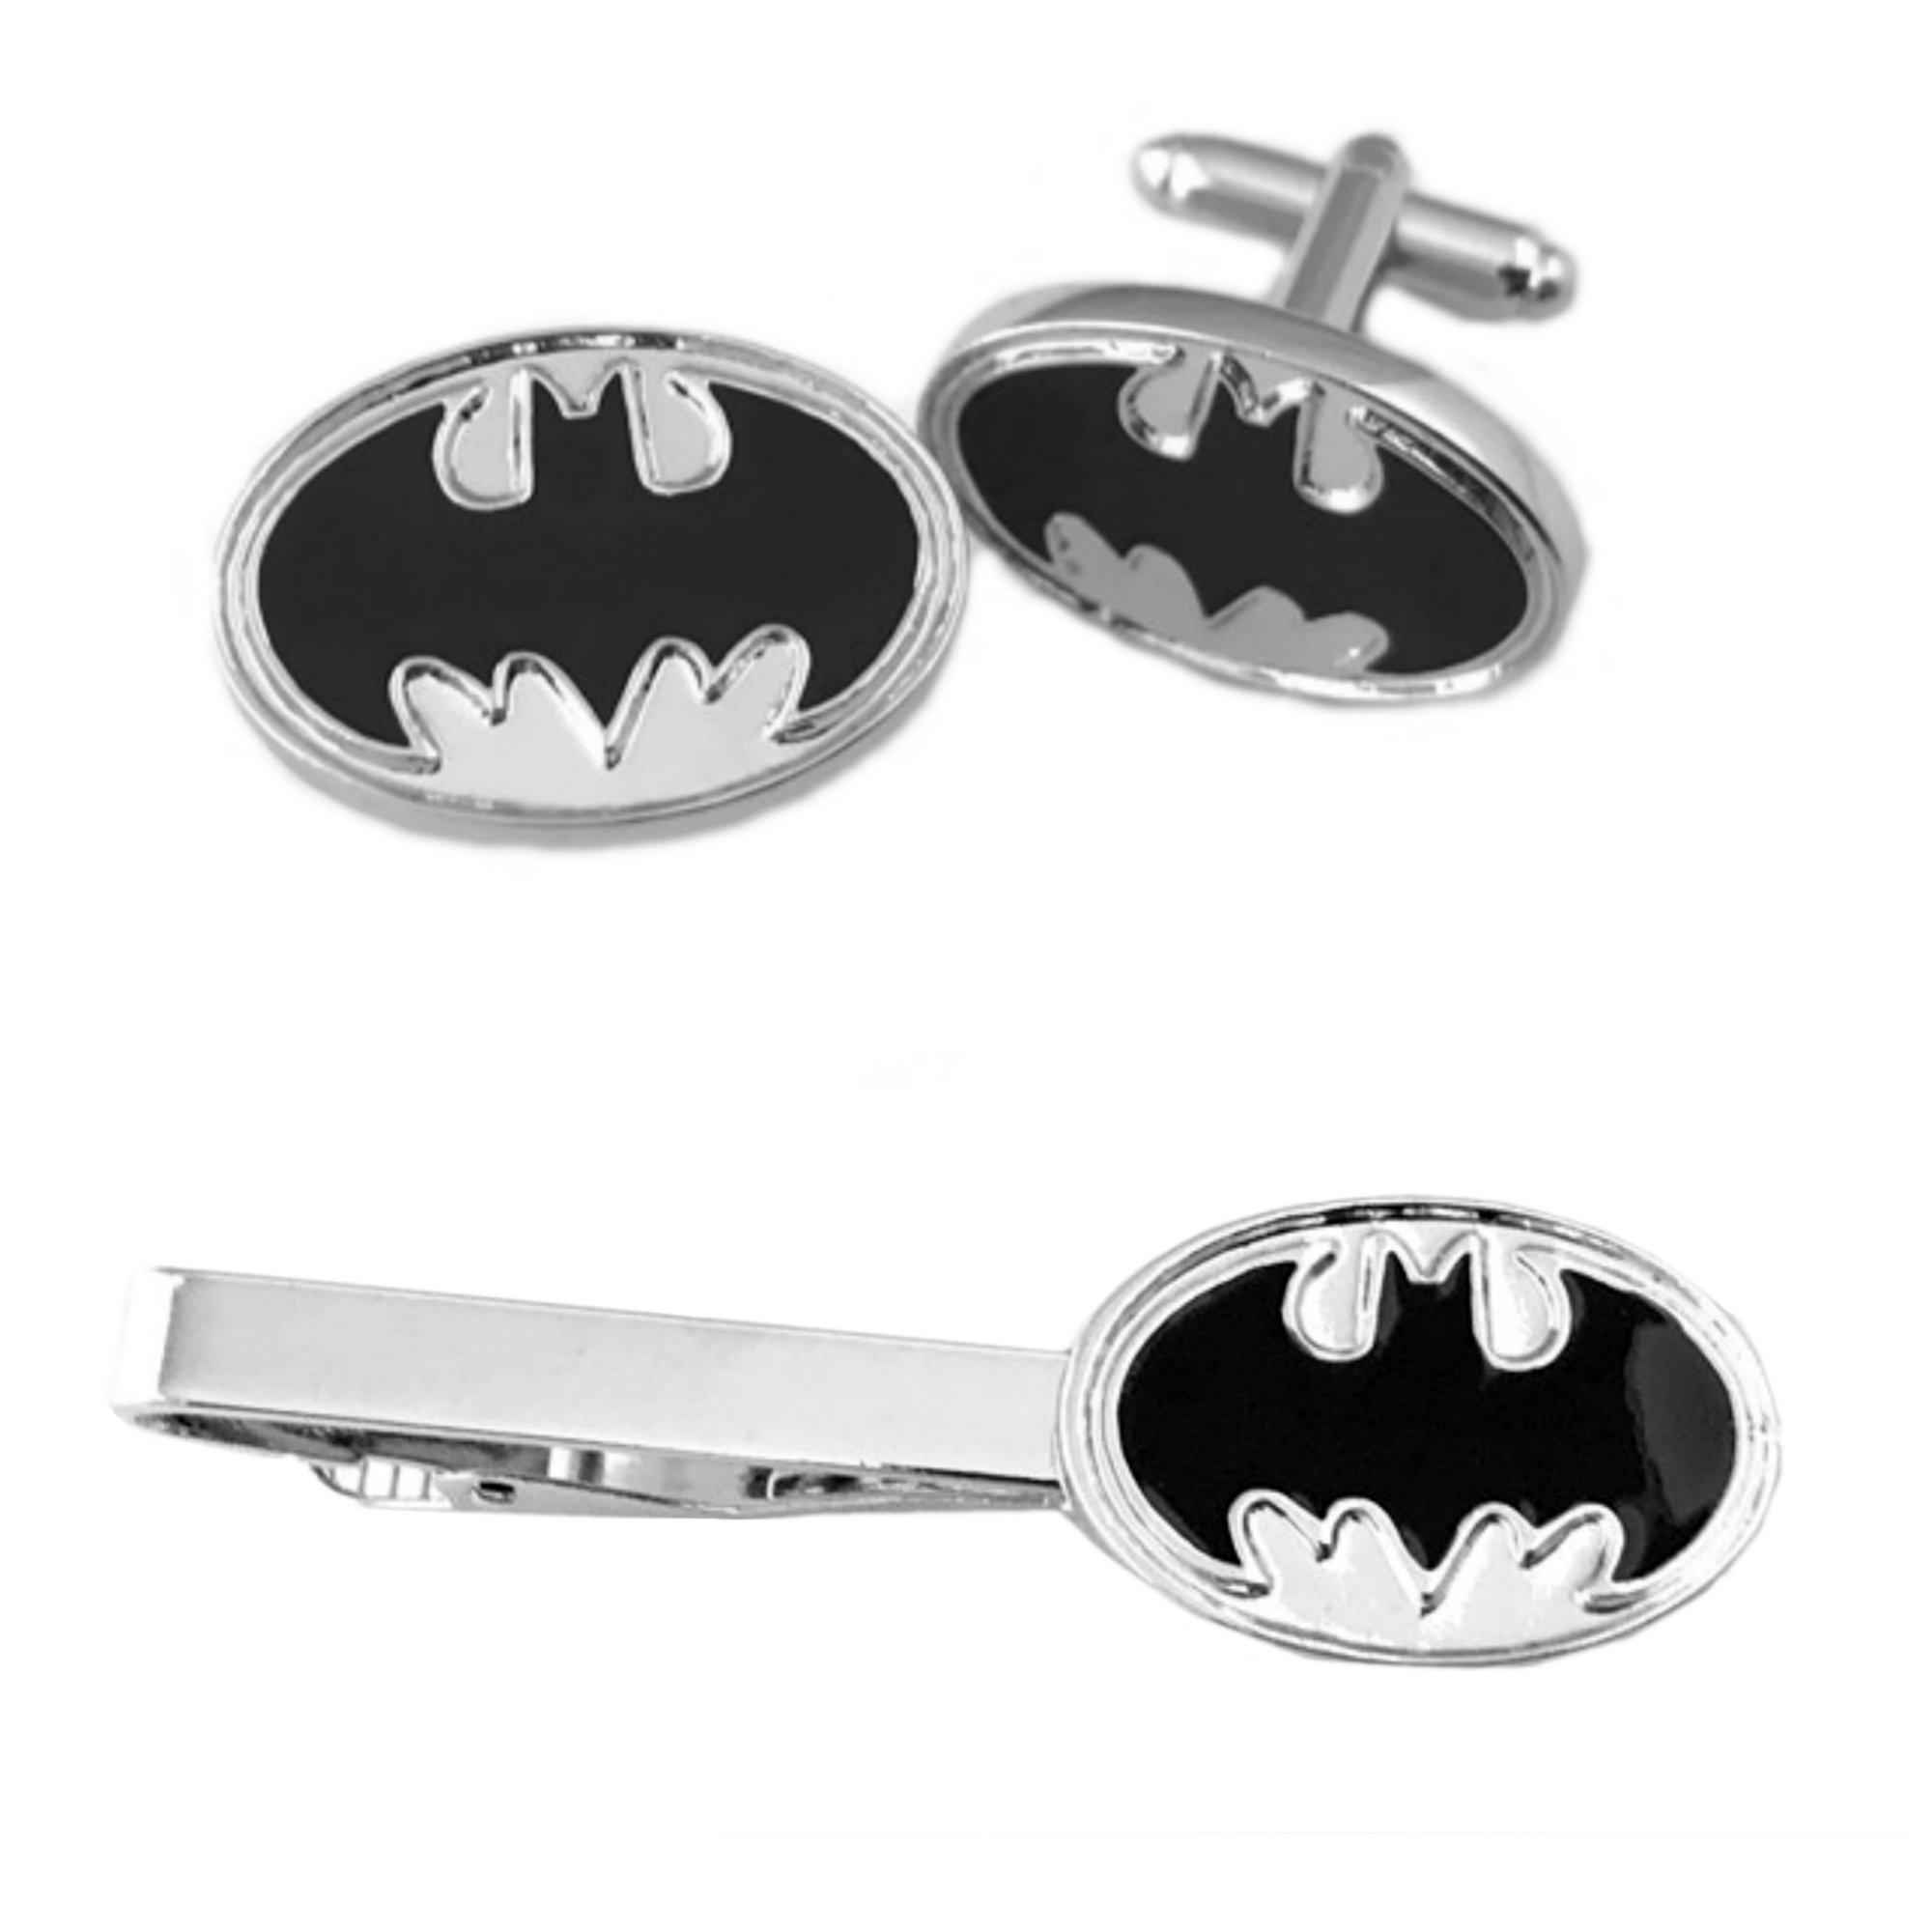 Outlander DC Comics - Batman Oval Cufflink & Tiebar - Set of 2 Wedding Superhero Logo w/Gift Box